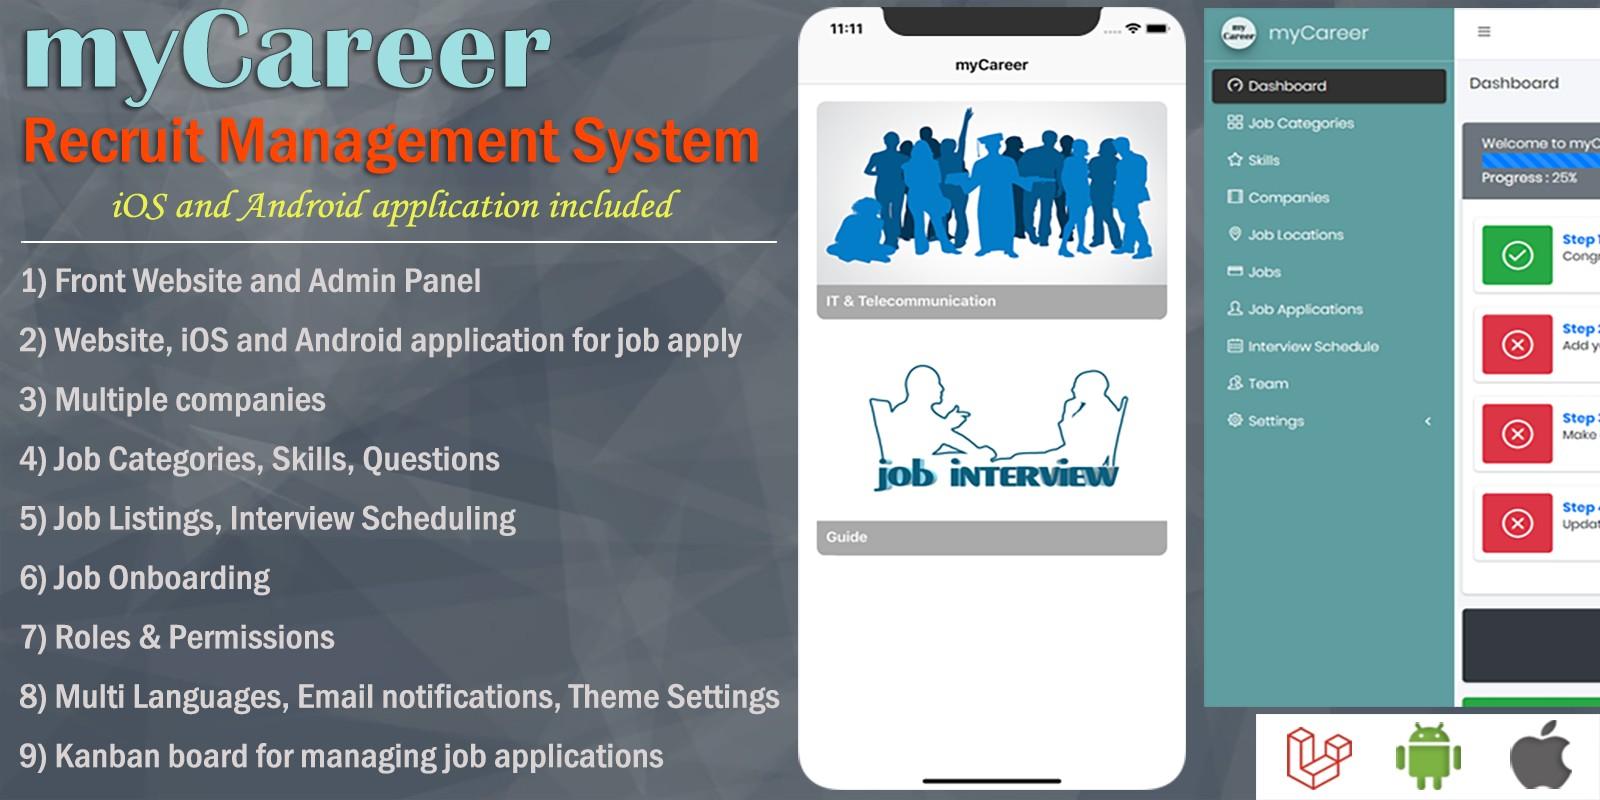 MyCareer – Recruit Management System